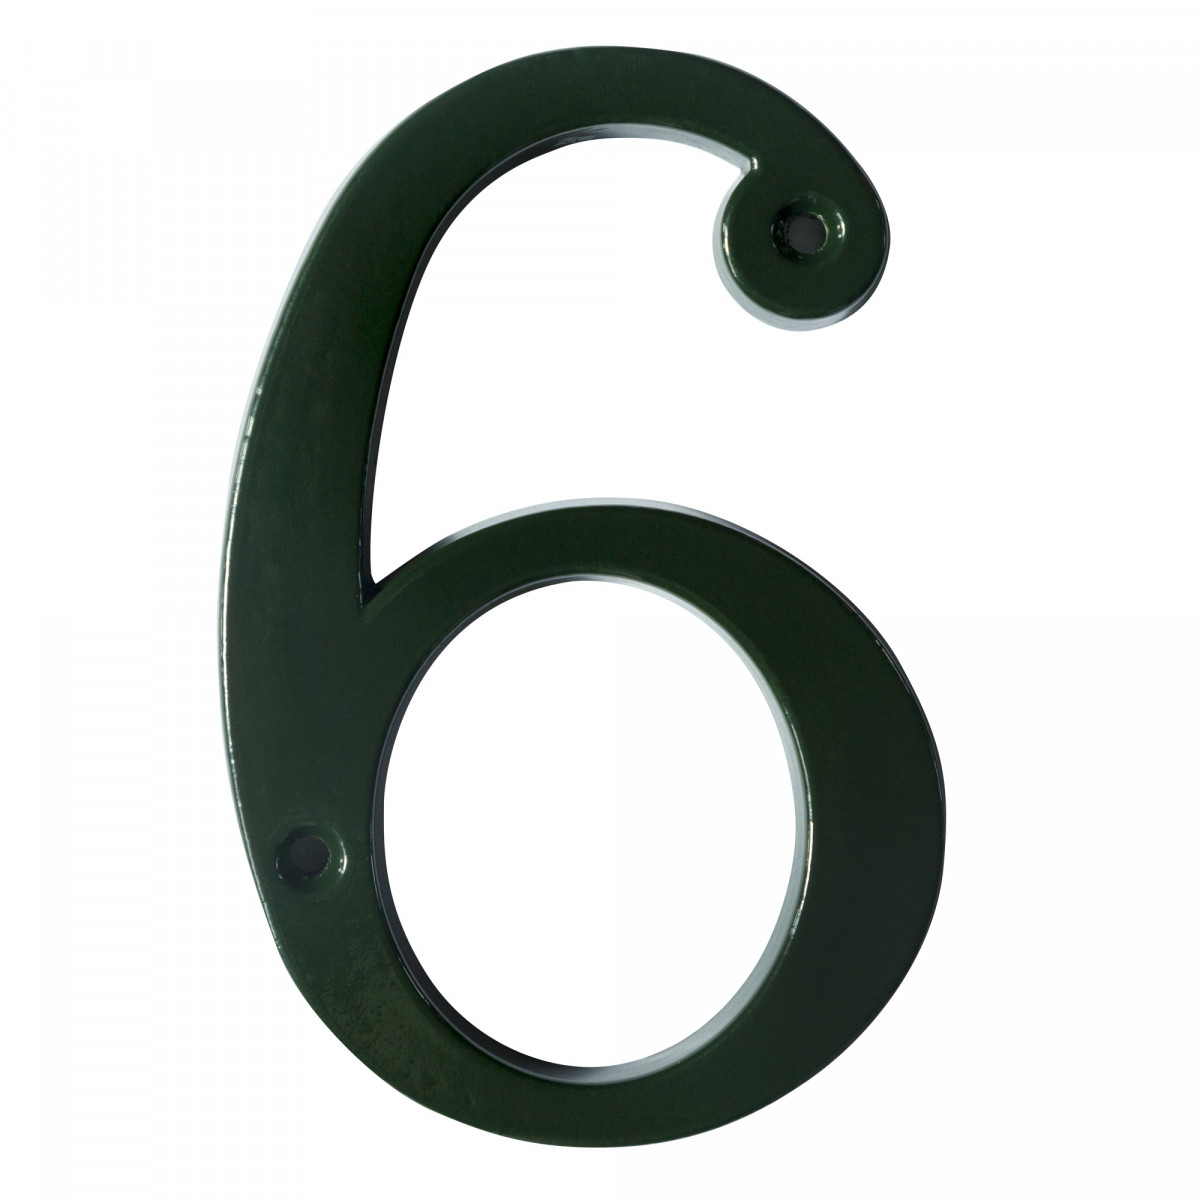 Huisnummer 6 (5856) - KS Verlichting - Huisnummers